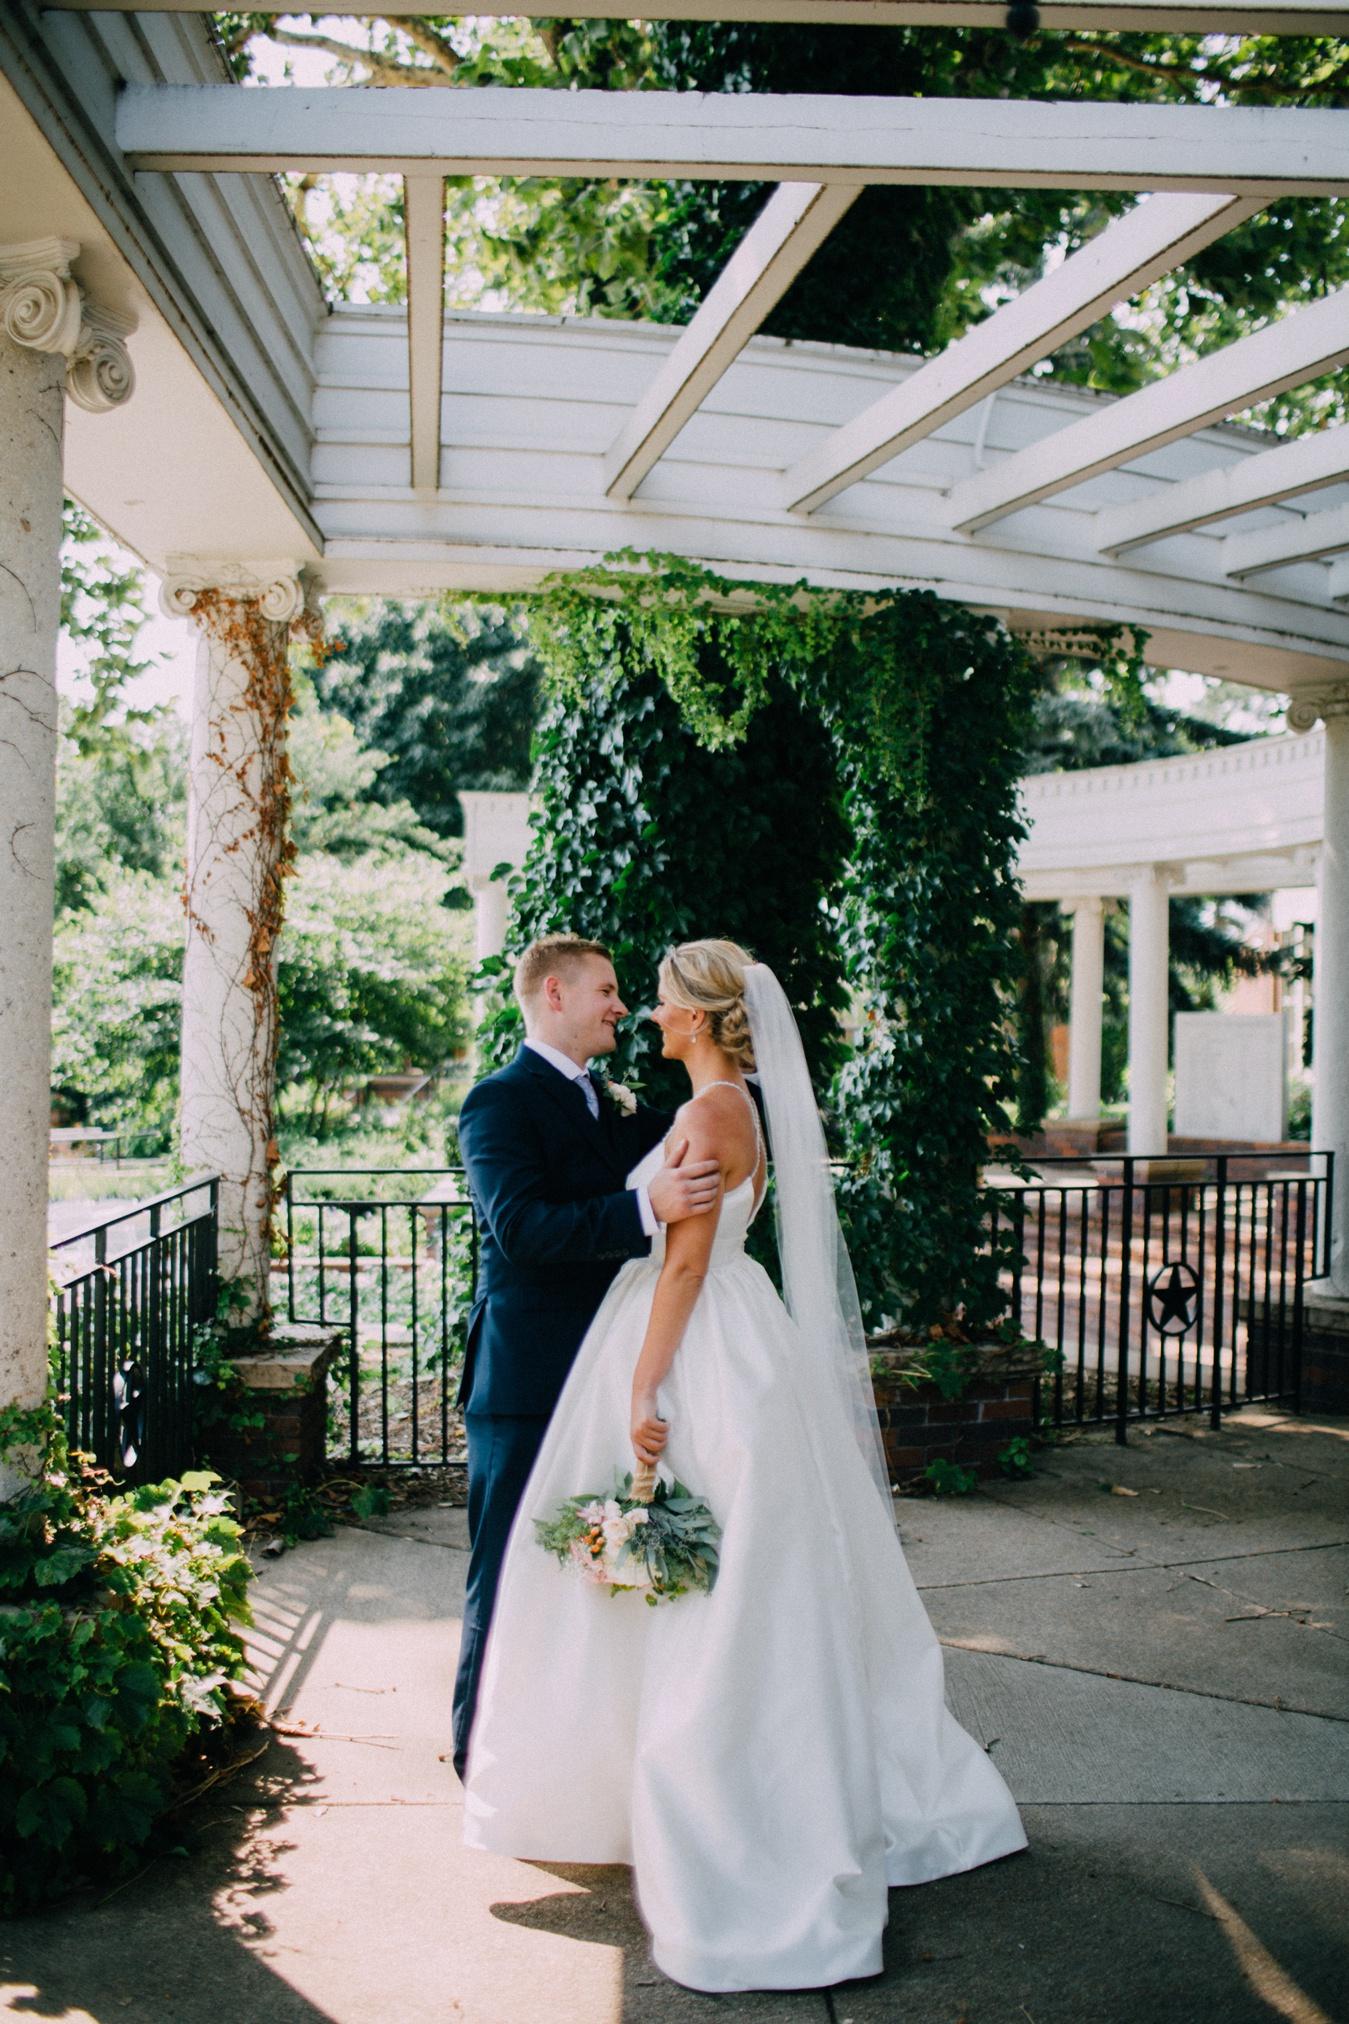 brenna+michael_wedding-264.jpg